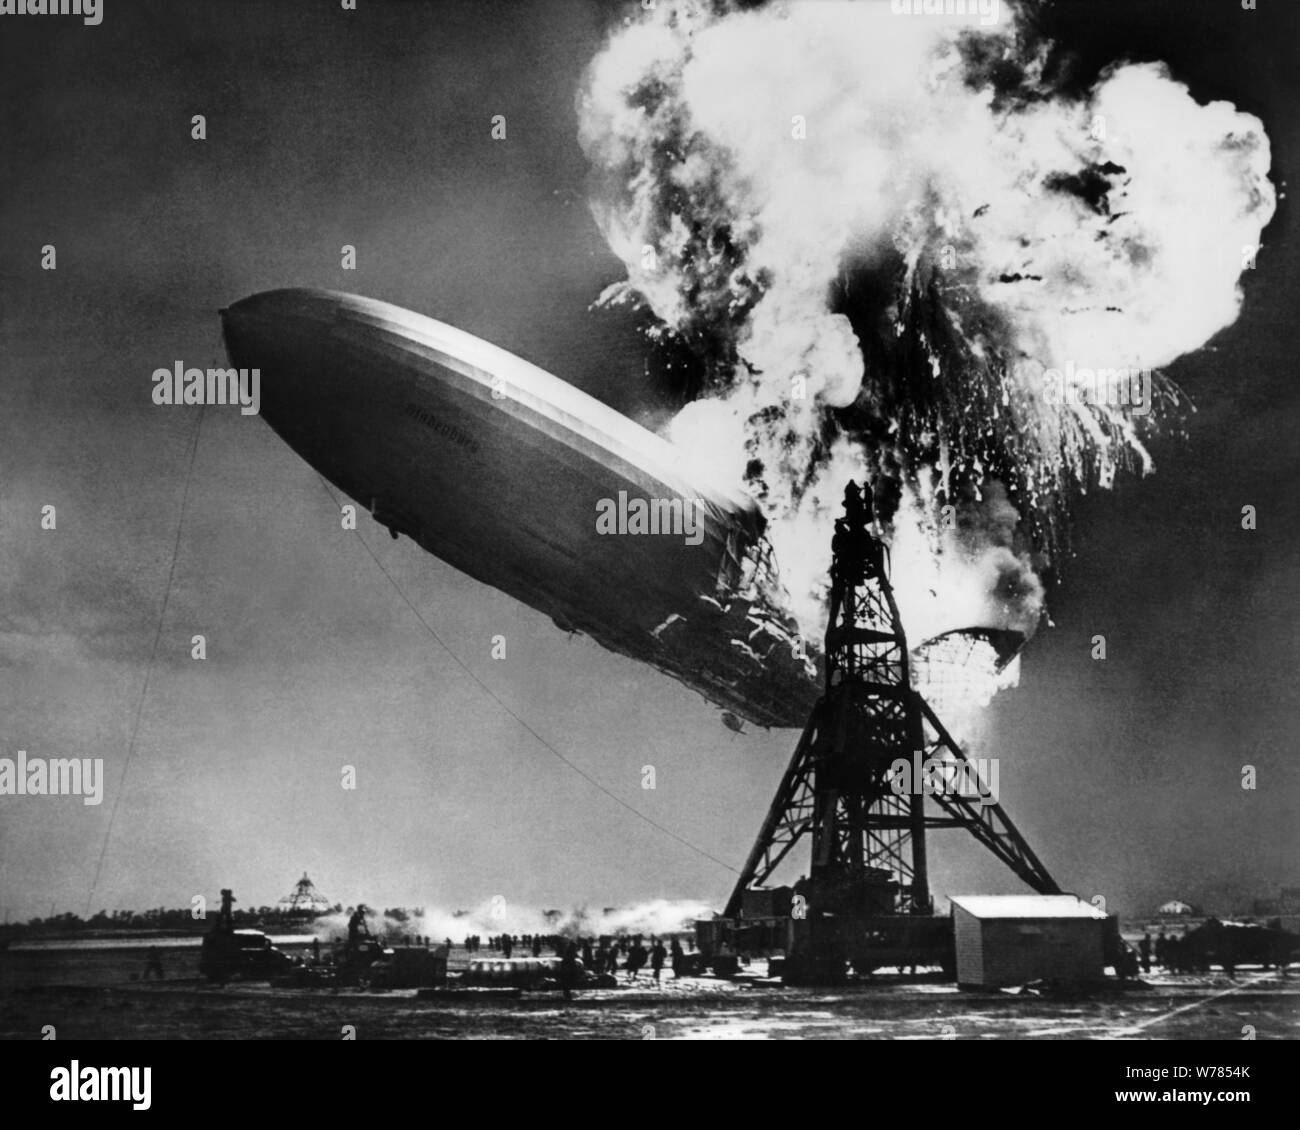 LZ 129 HINDENBURG HINDENBURG DISASTER NEWSREEL FOOTAGE, 1937 Stockfoto